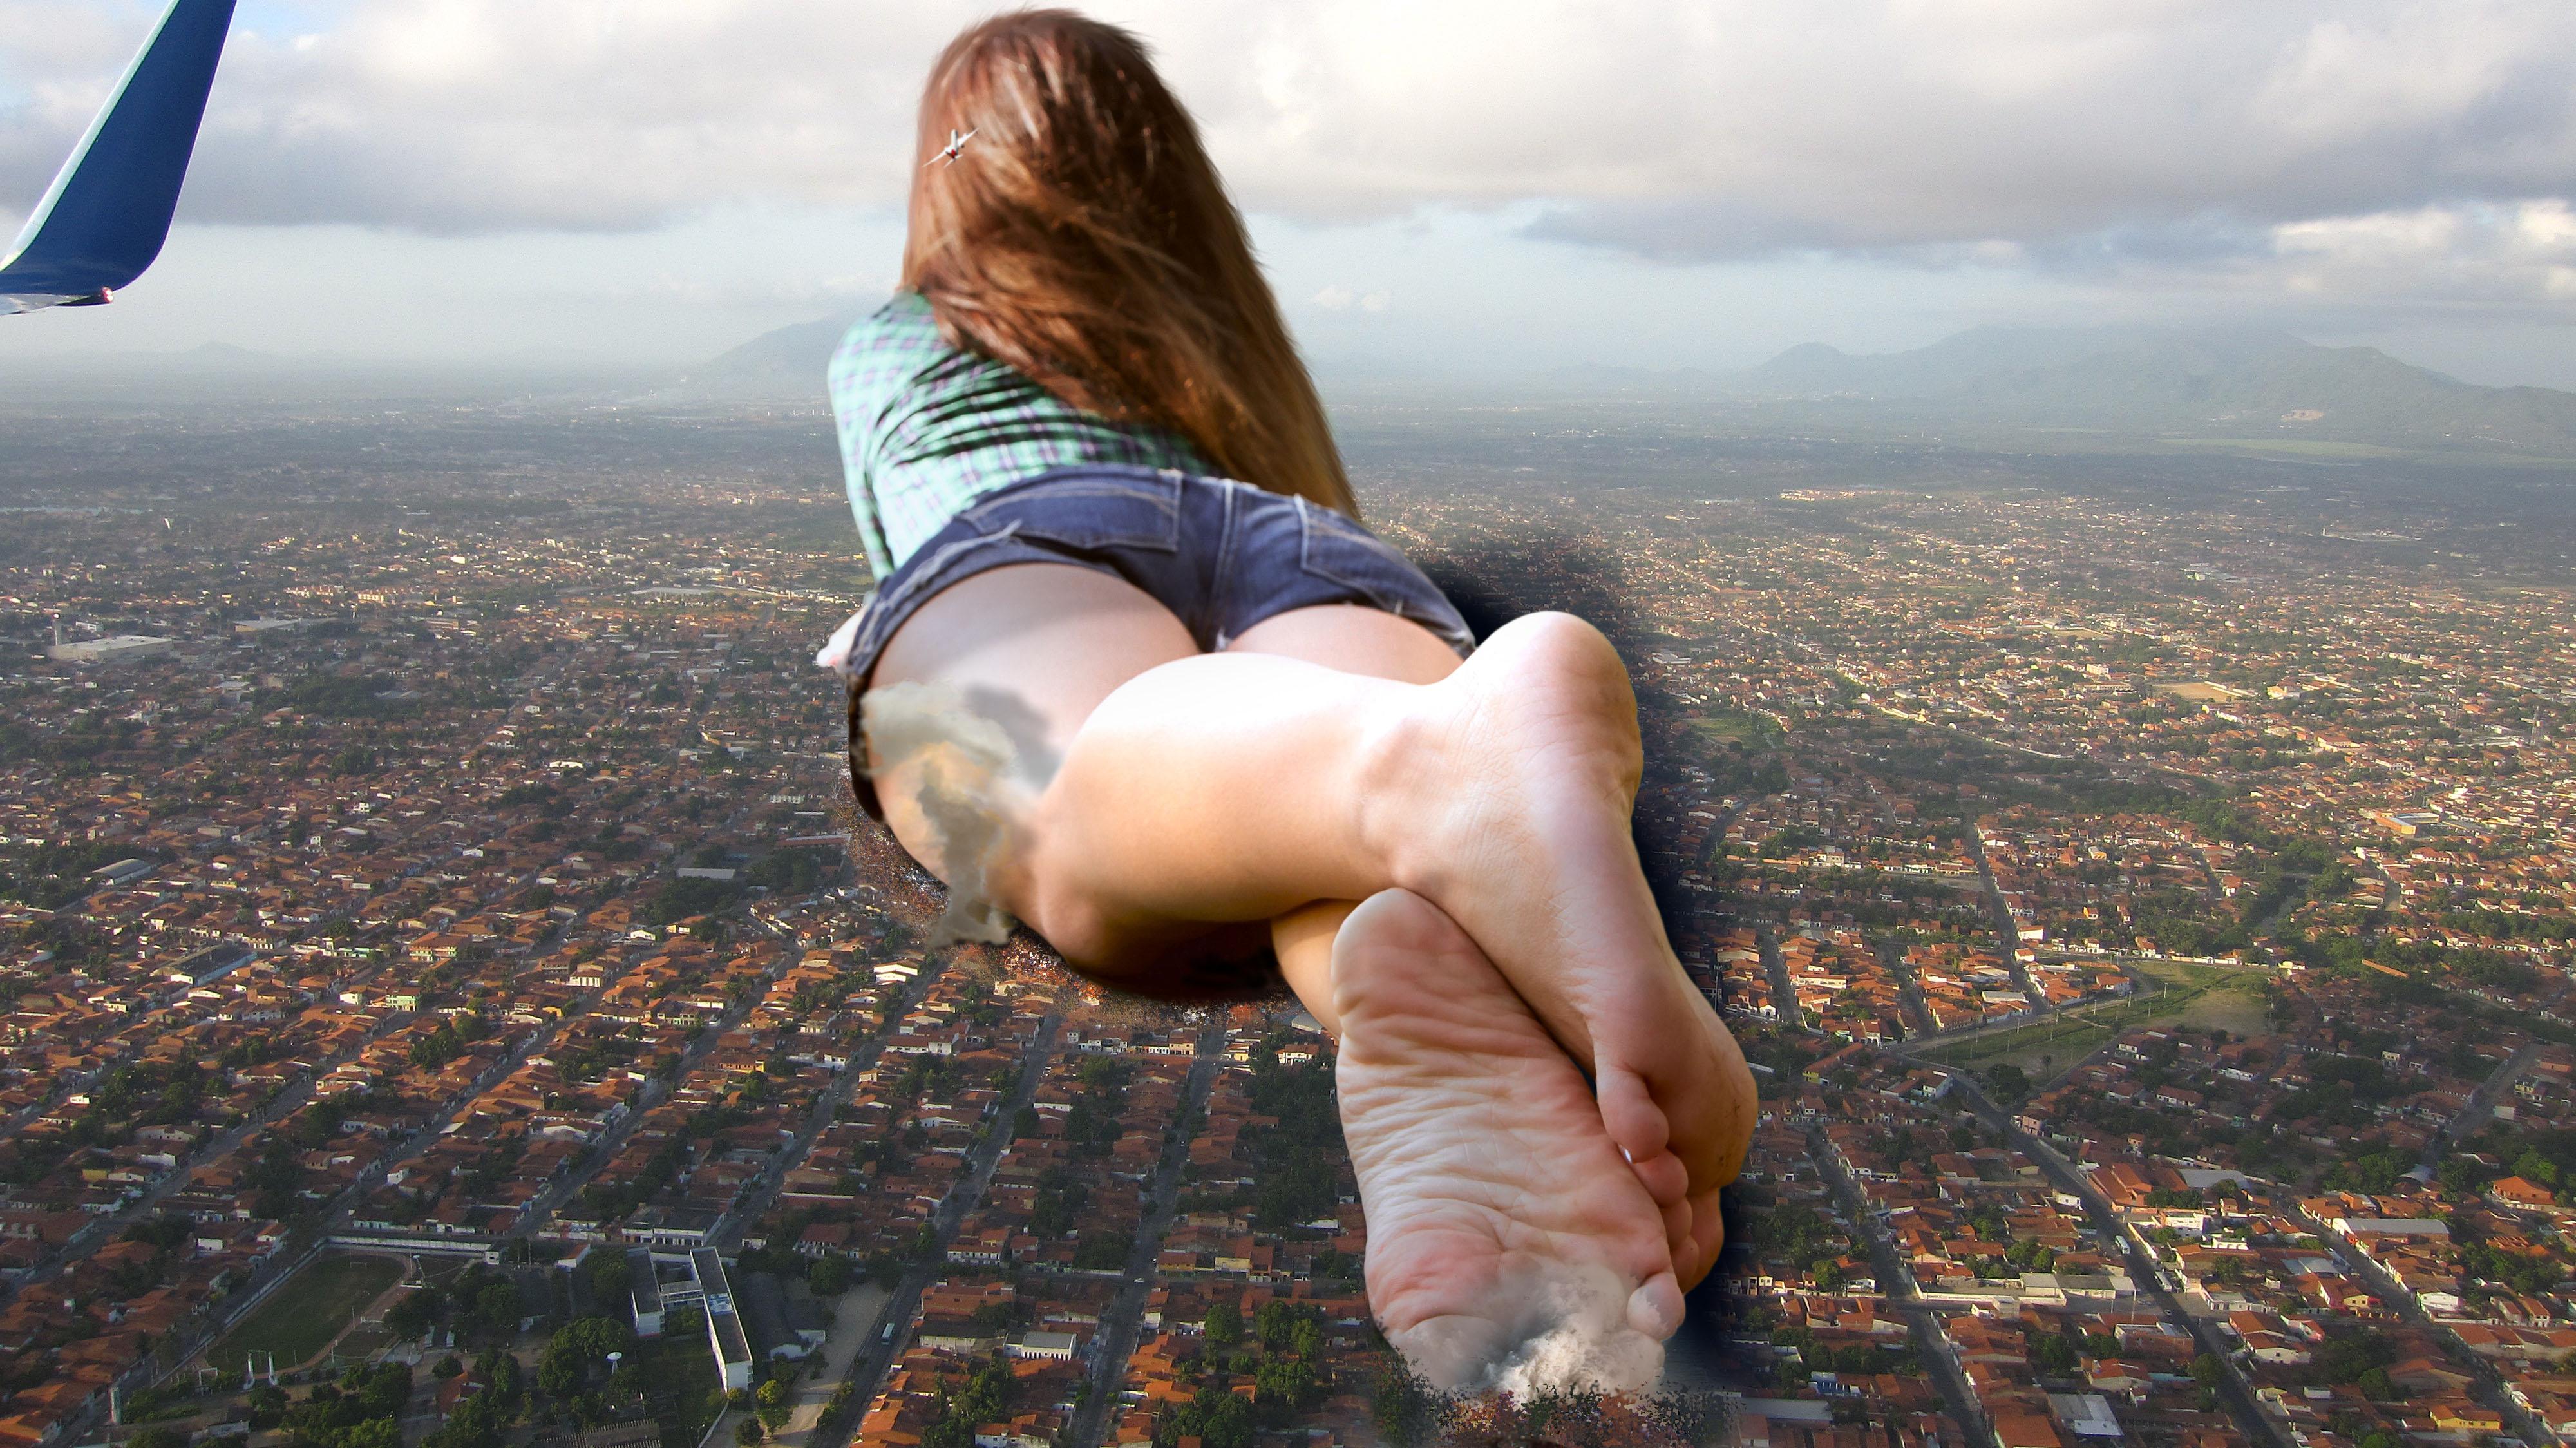 Katelyn laying on the city by WonderSlug